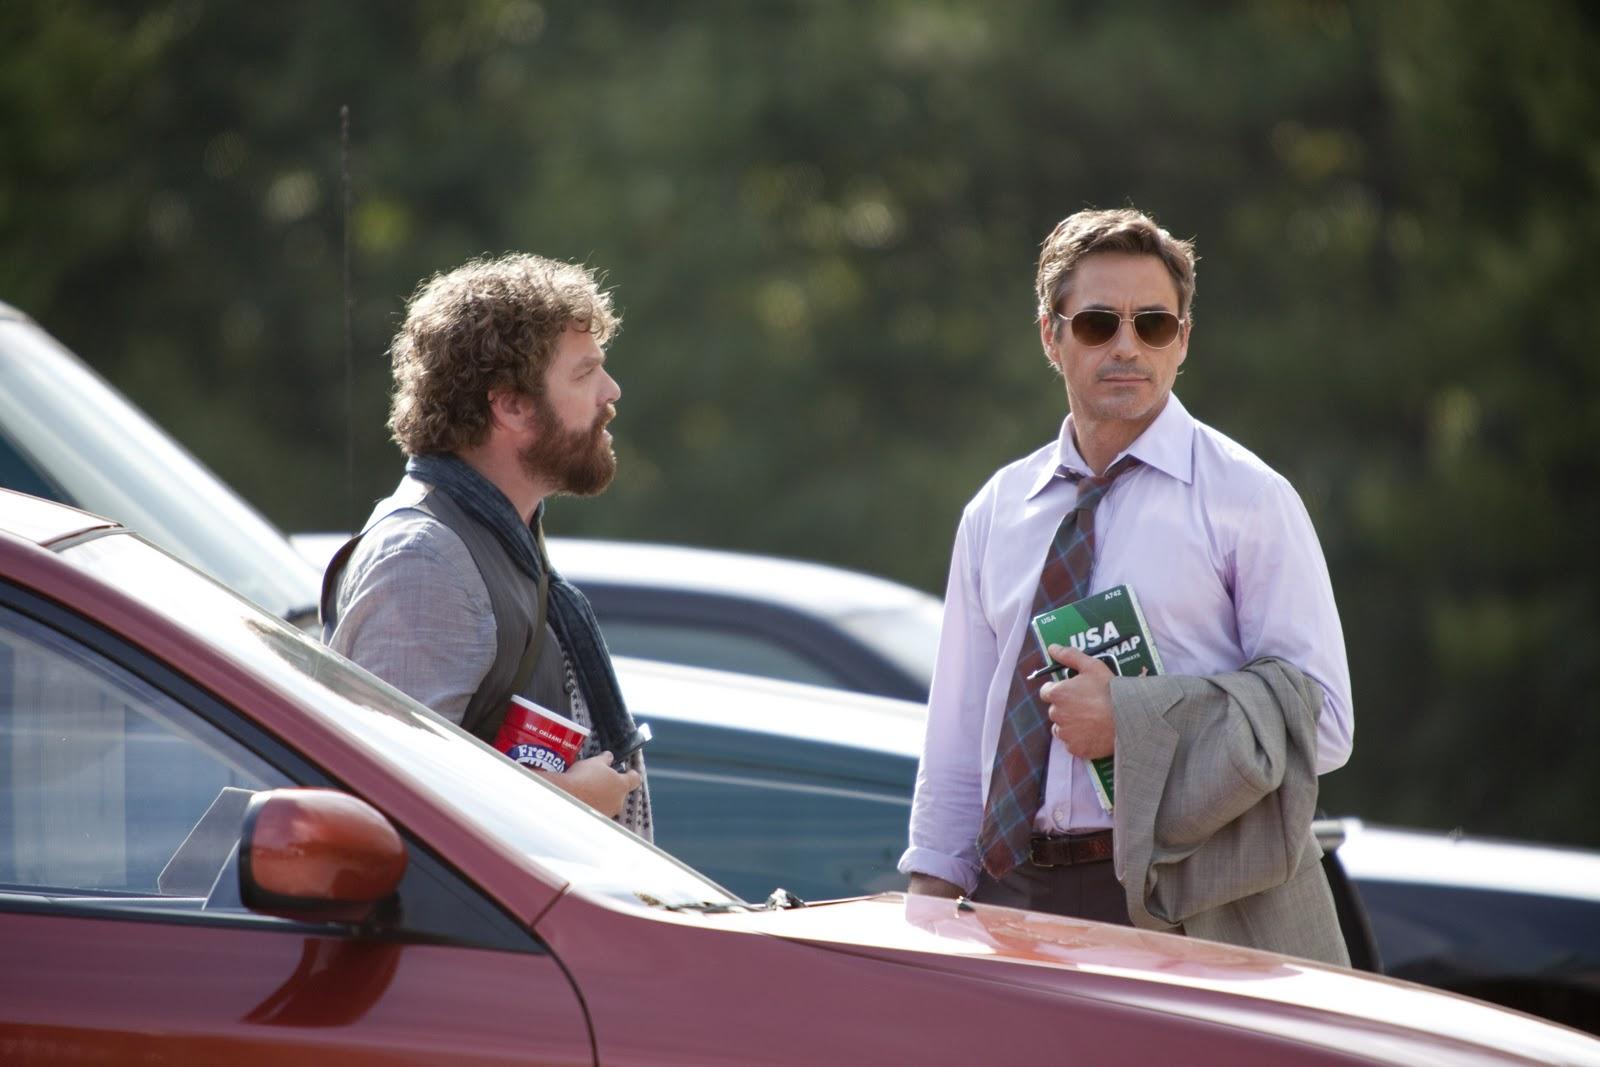 http://3.bp.blogspot.com/_w6GL1DCUVfk/TG9fuFsdBUI/AAAAAAAAFS0/L472CEOGCn0/s1600/Due_Date_movie_image_Robert_Downey_Jr_Zach_Galifianakis-2.jpg